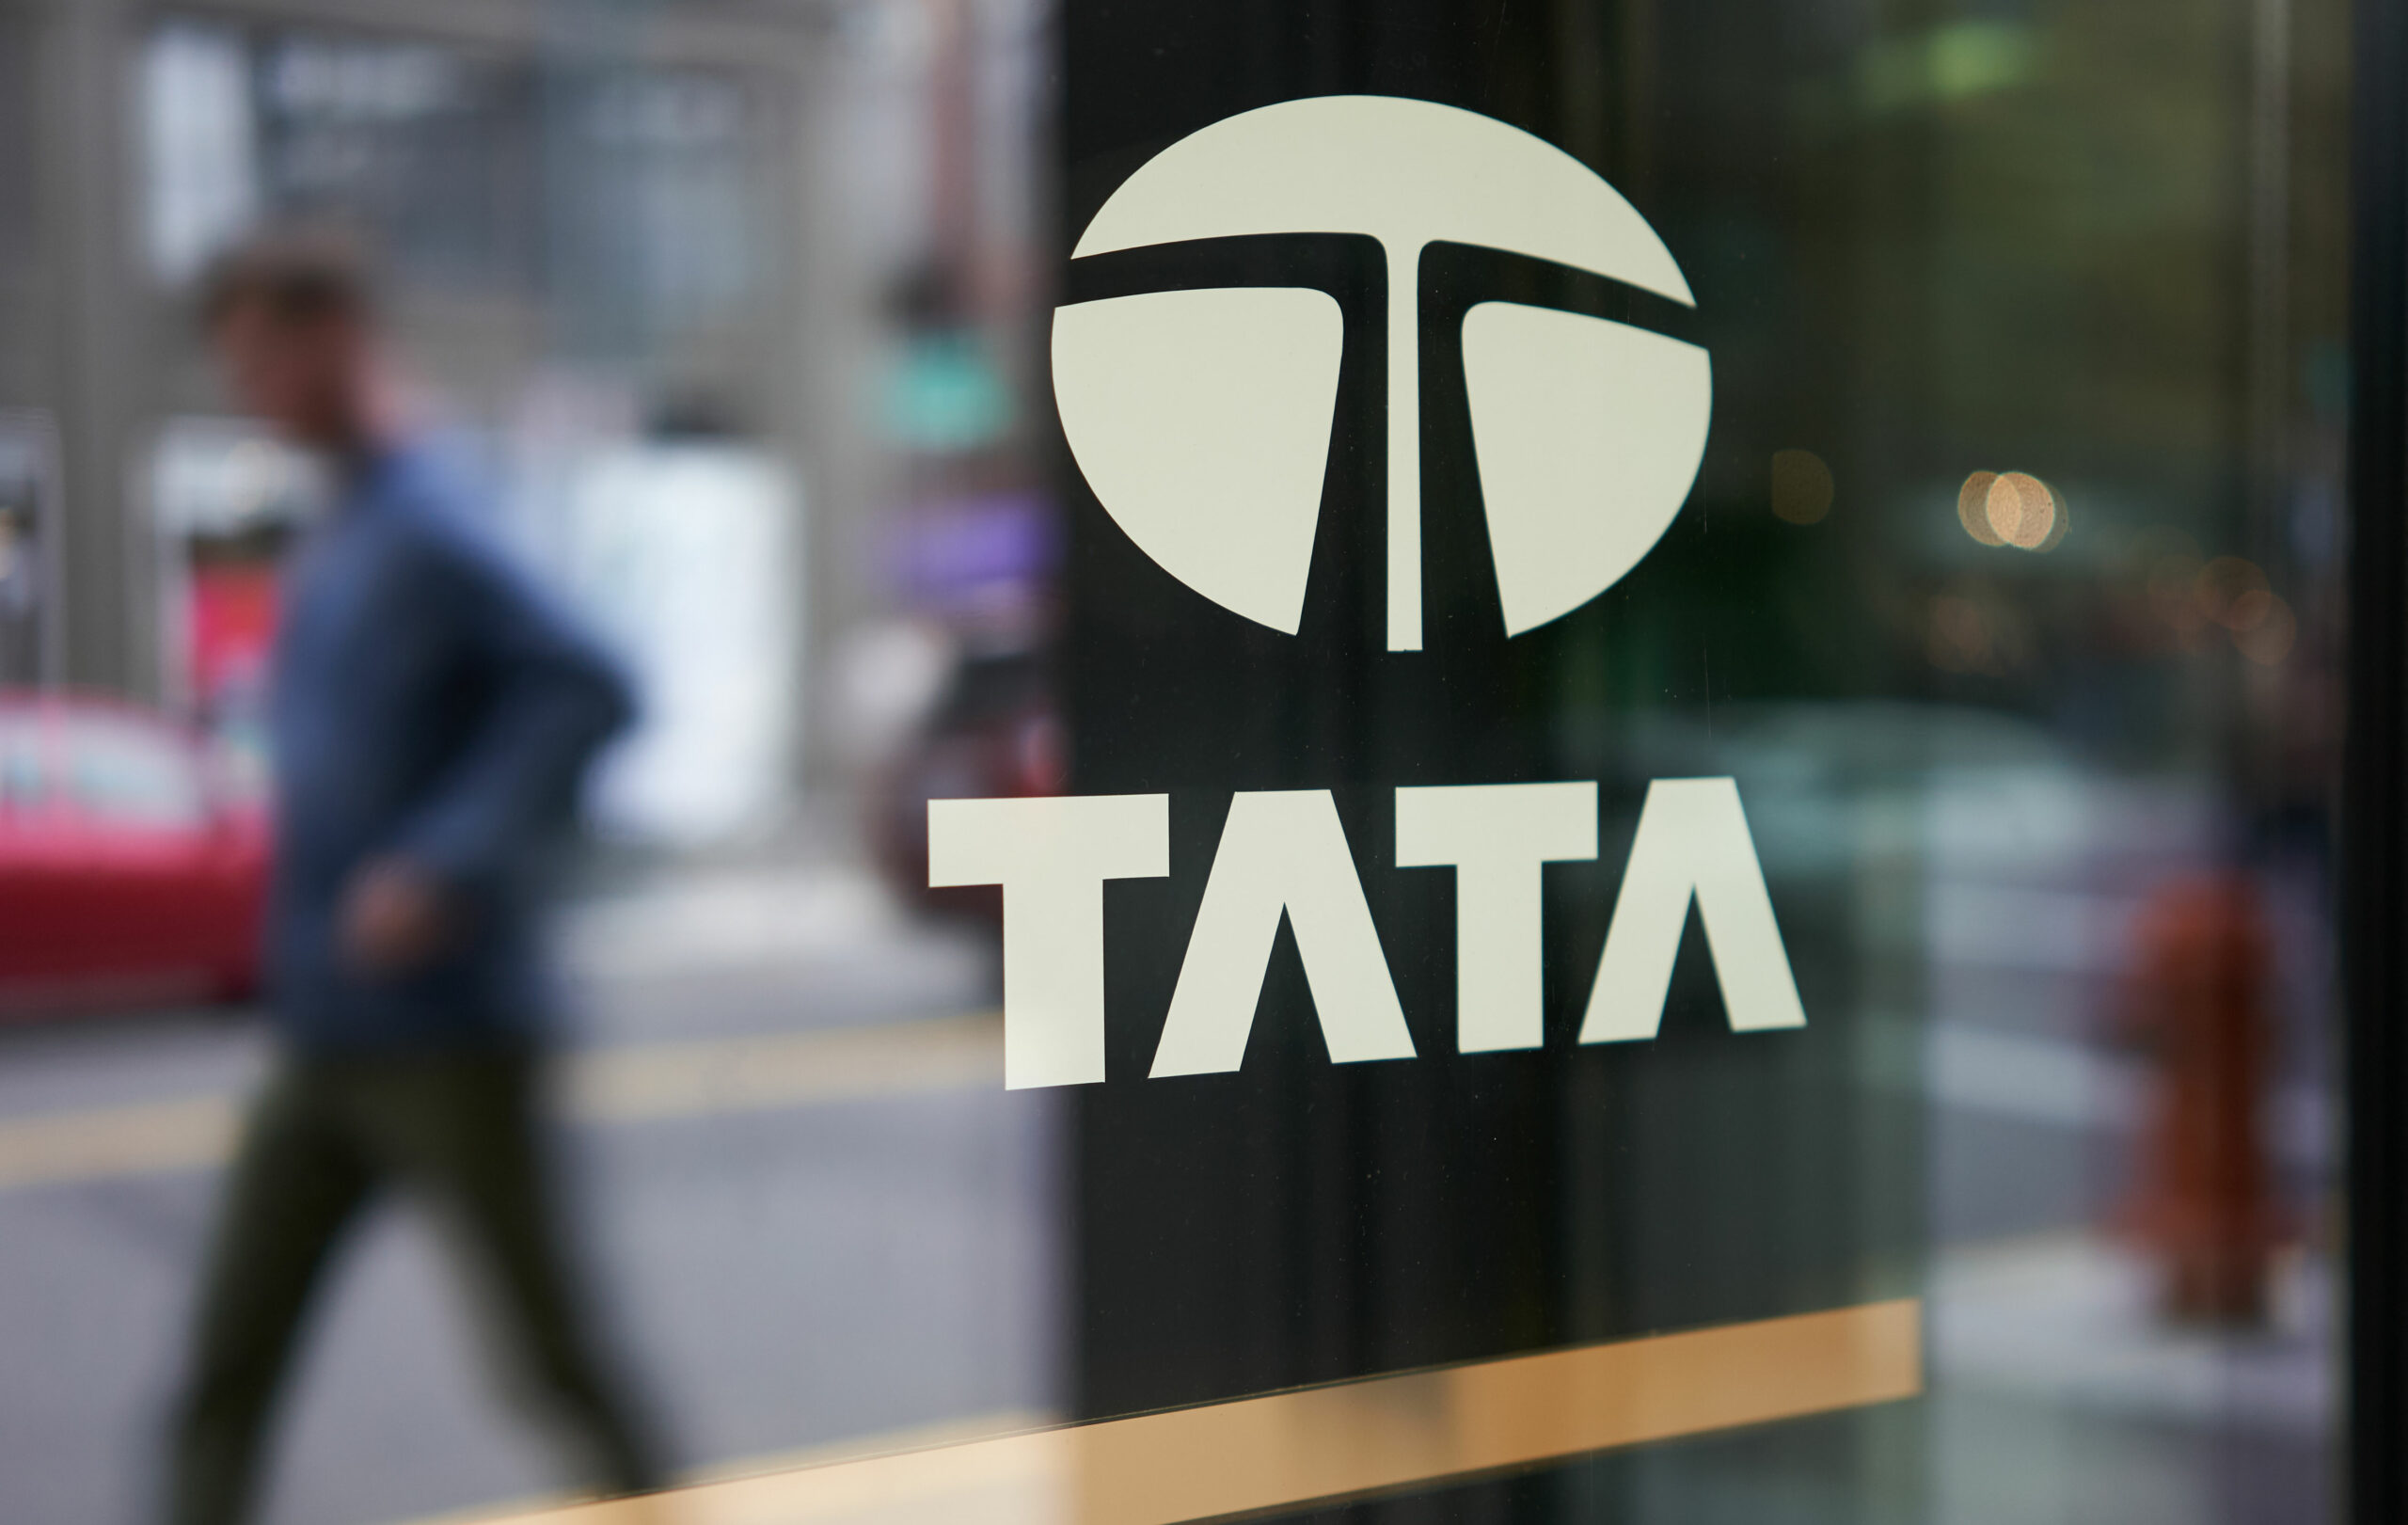 Tata logo on Glass